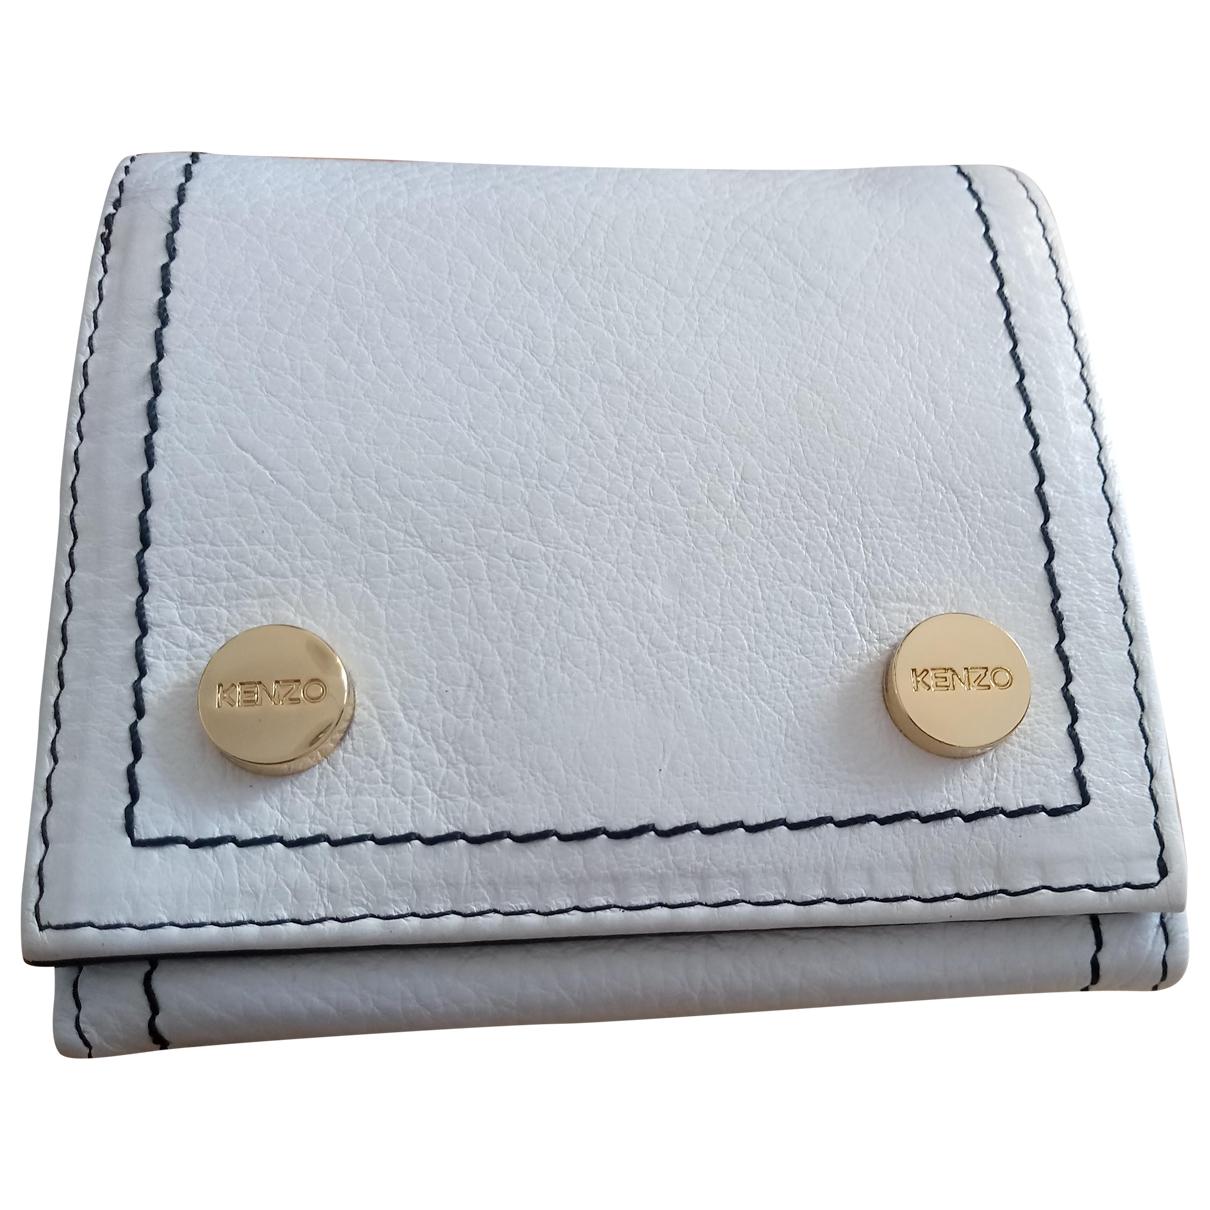 Kenzo \N White Leather wallet for Women \N